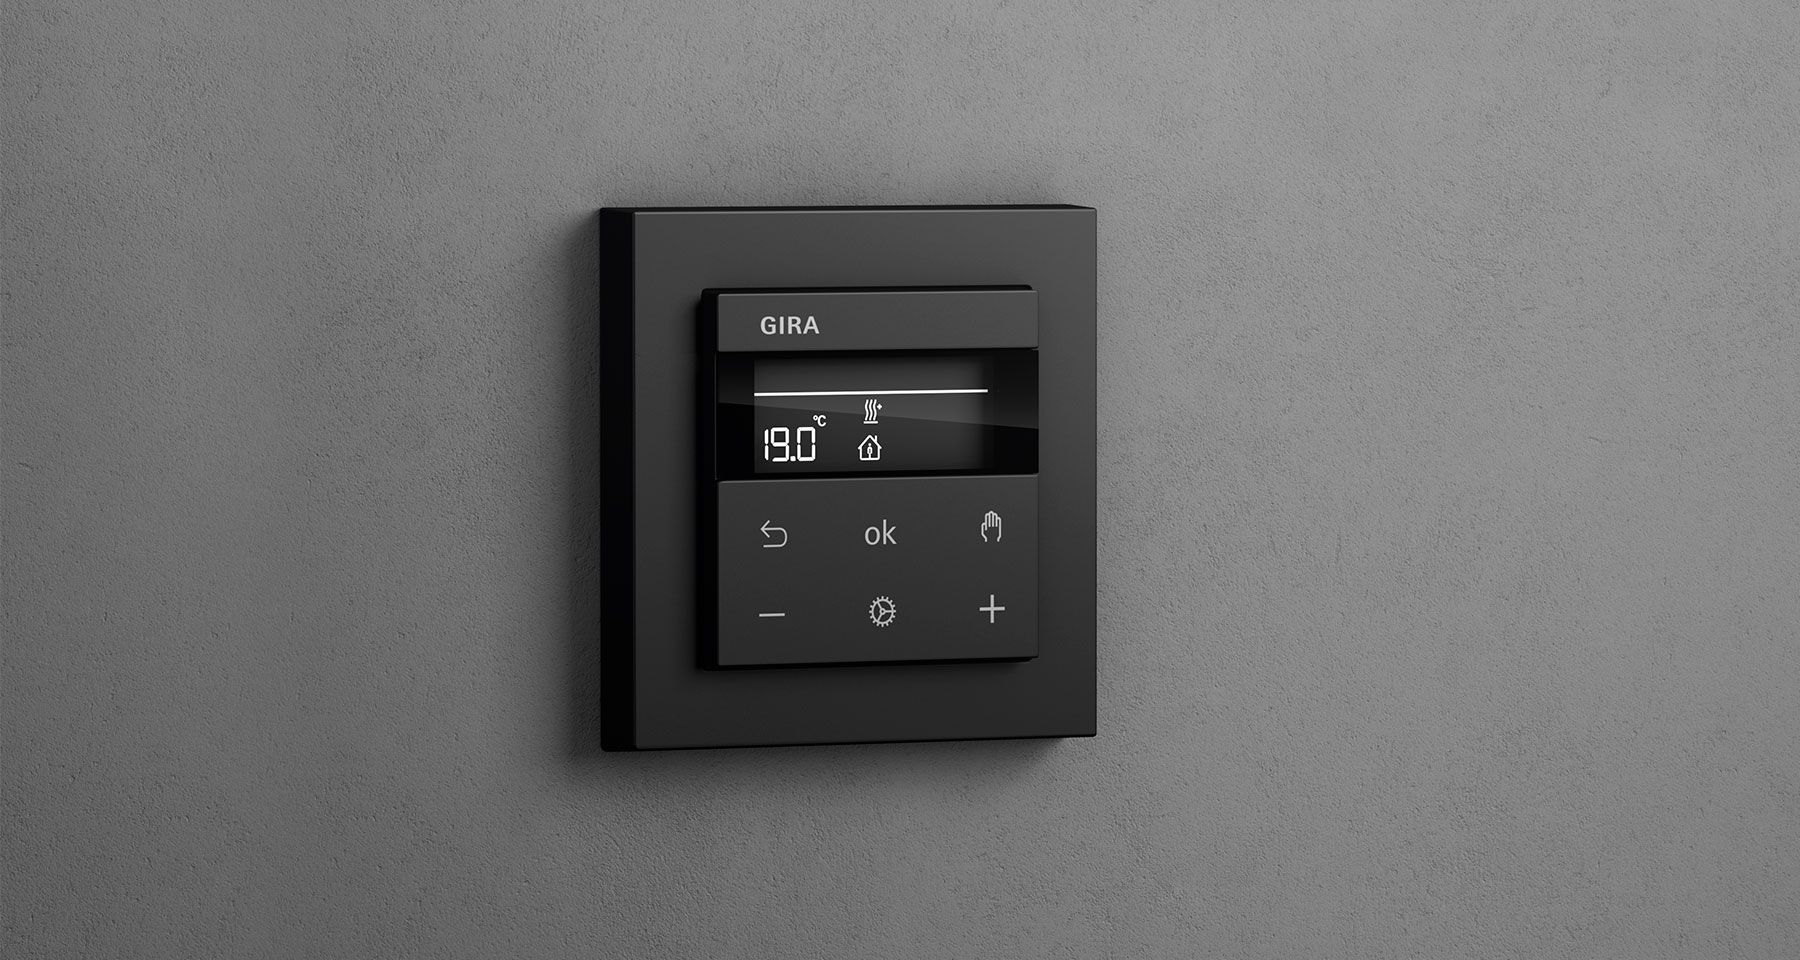 Gira System 3000 Raumtemperatur-regler